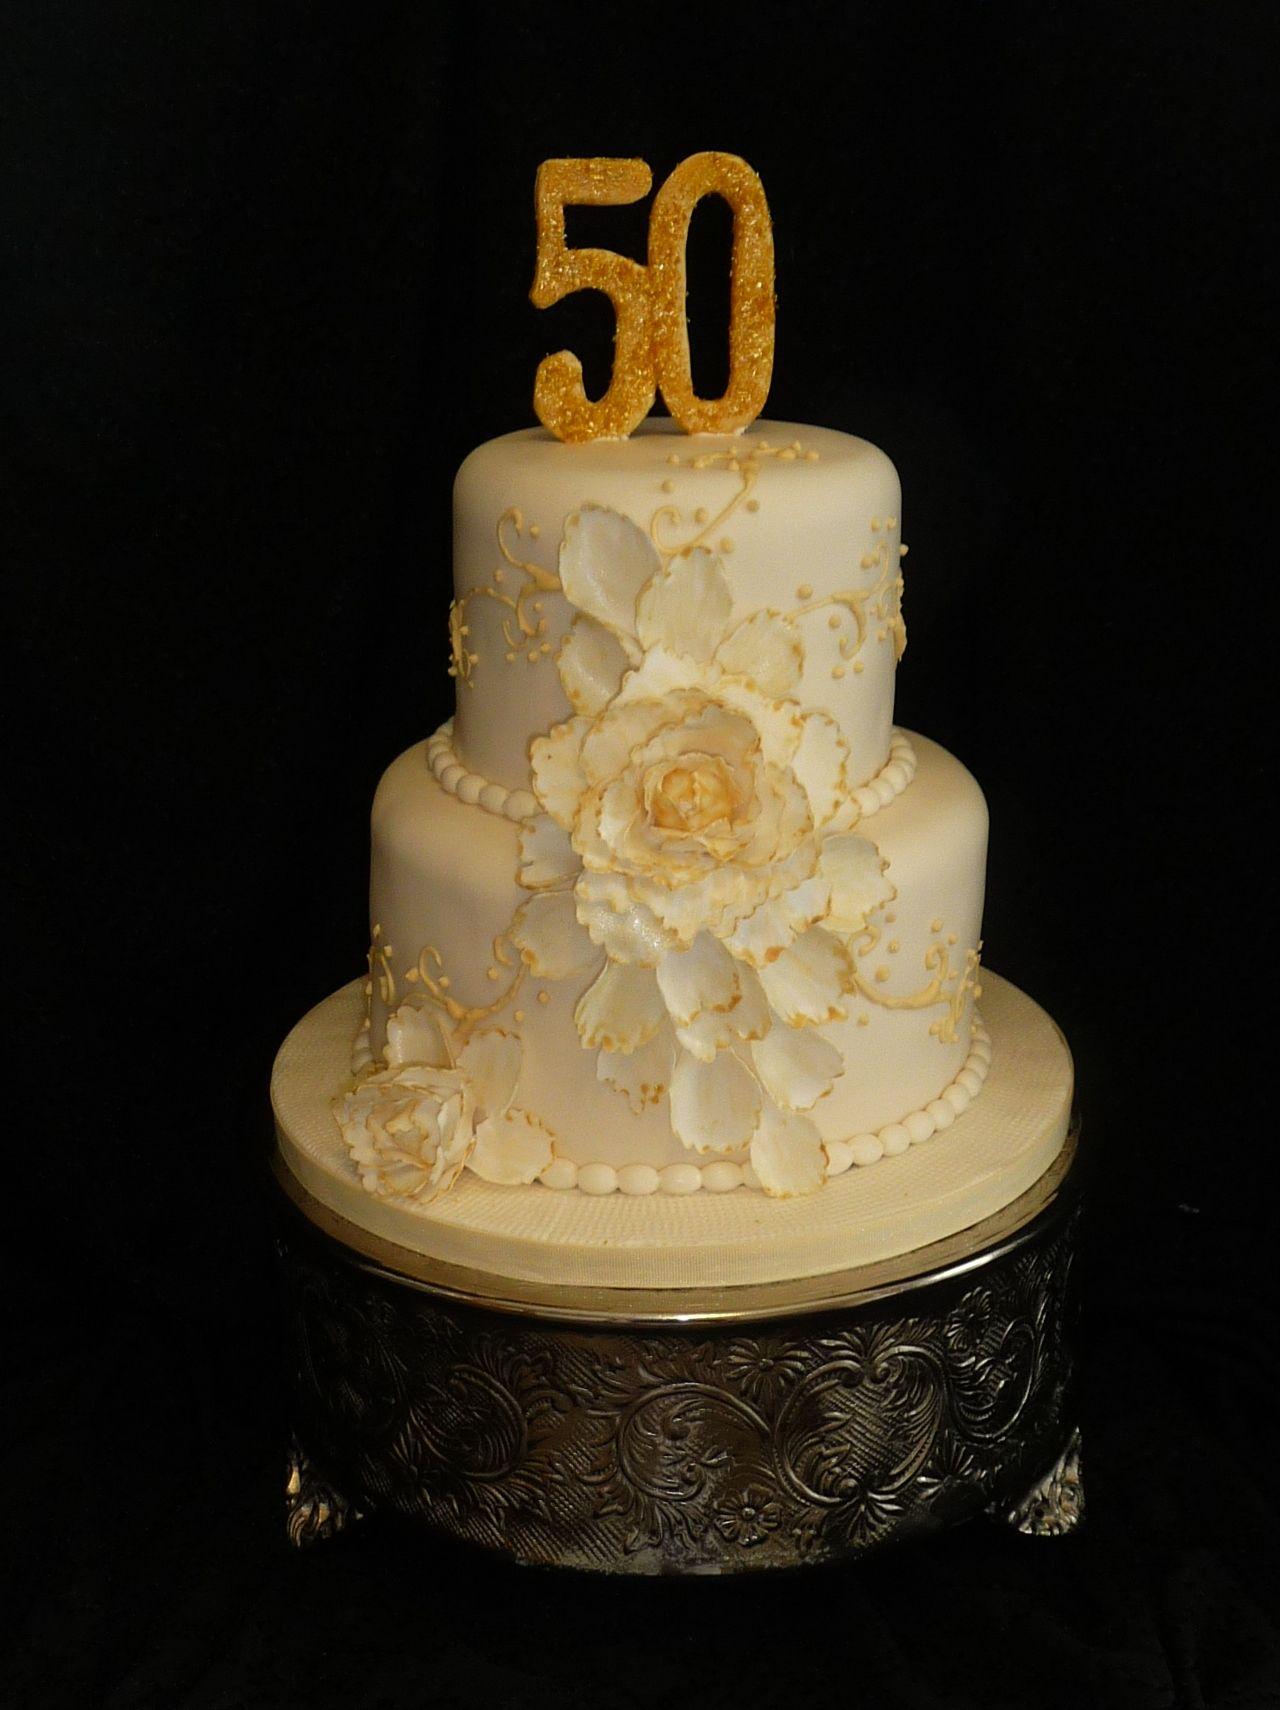 50th wedding anniversary cake 50th wedding anniversary